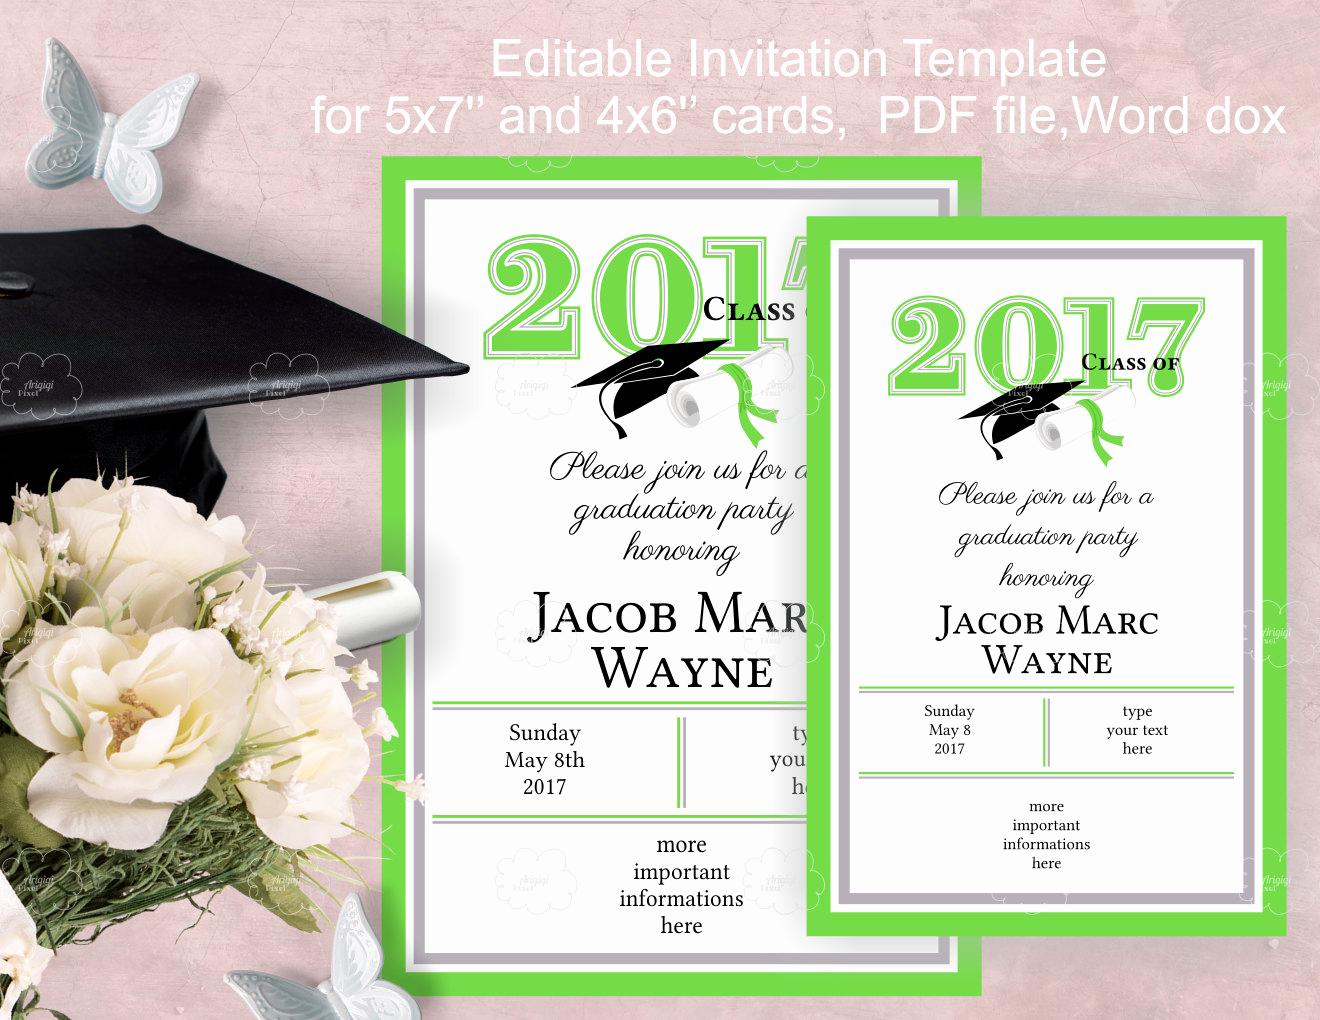 Free Graduation Party Invitation Elegant Graduation Party Invitation Template Edit Yourself